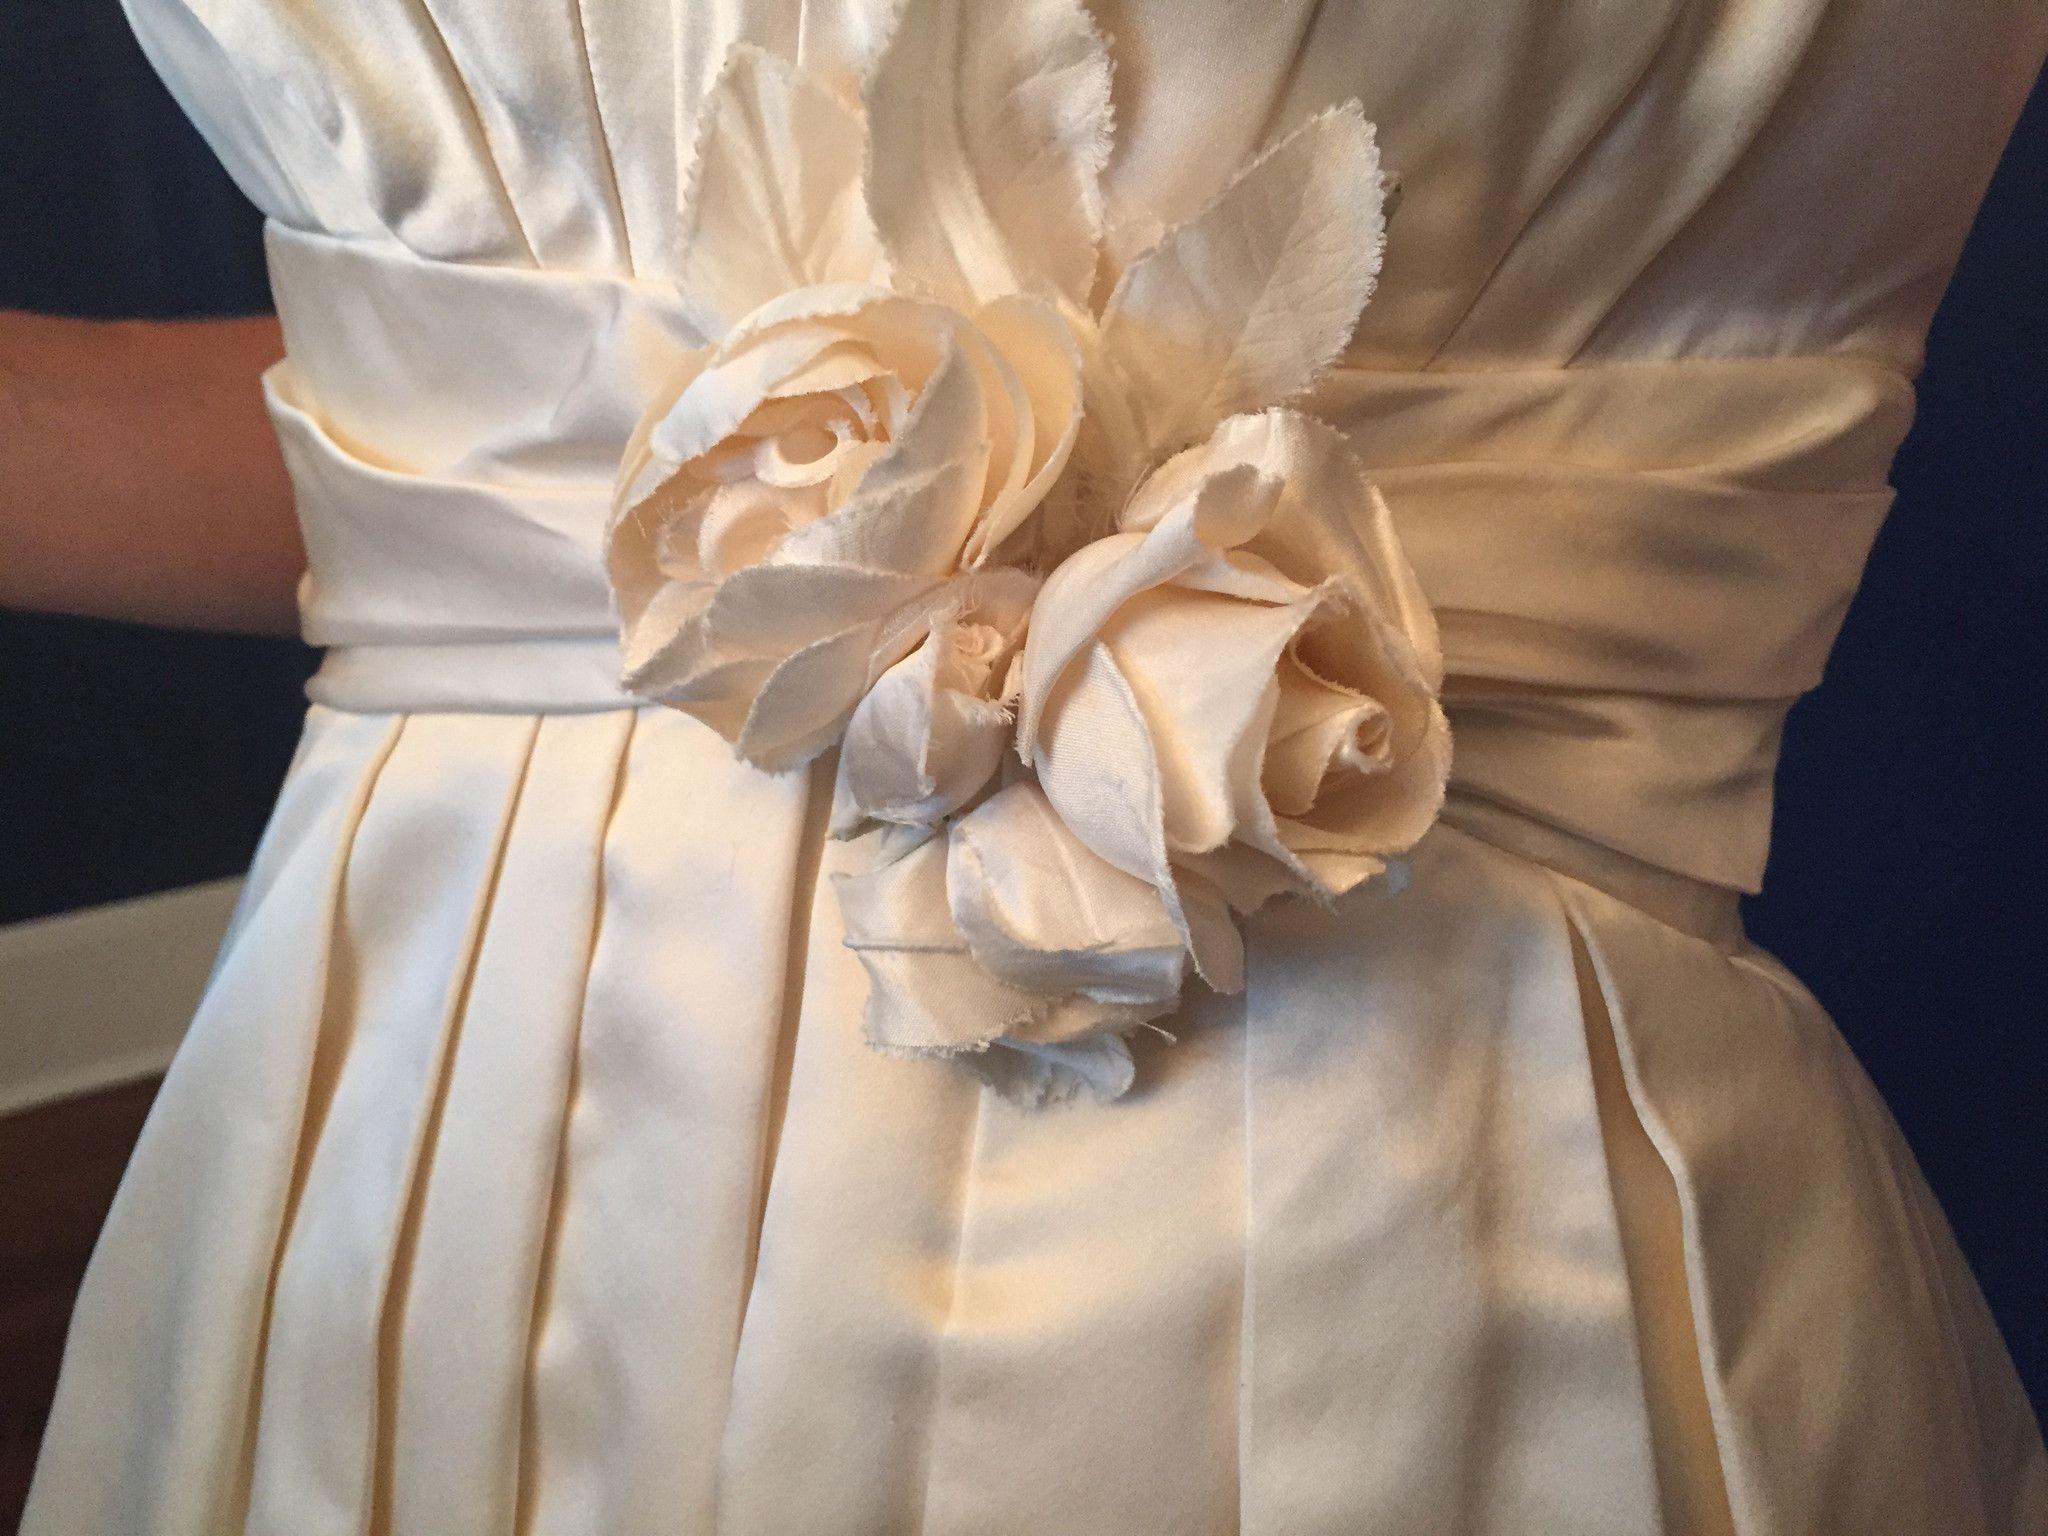 Priscilla of boston wedding dress  Priscilla of Boston uu  products  Pinterest  Wedding dress